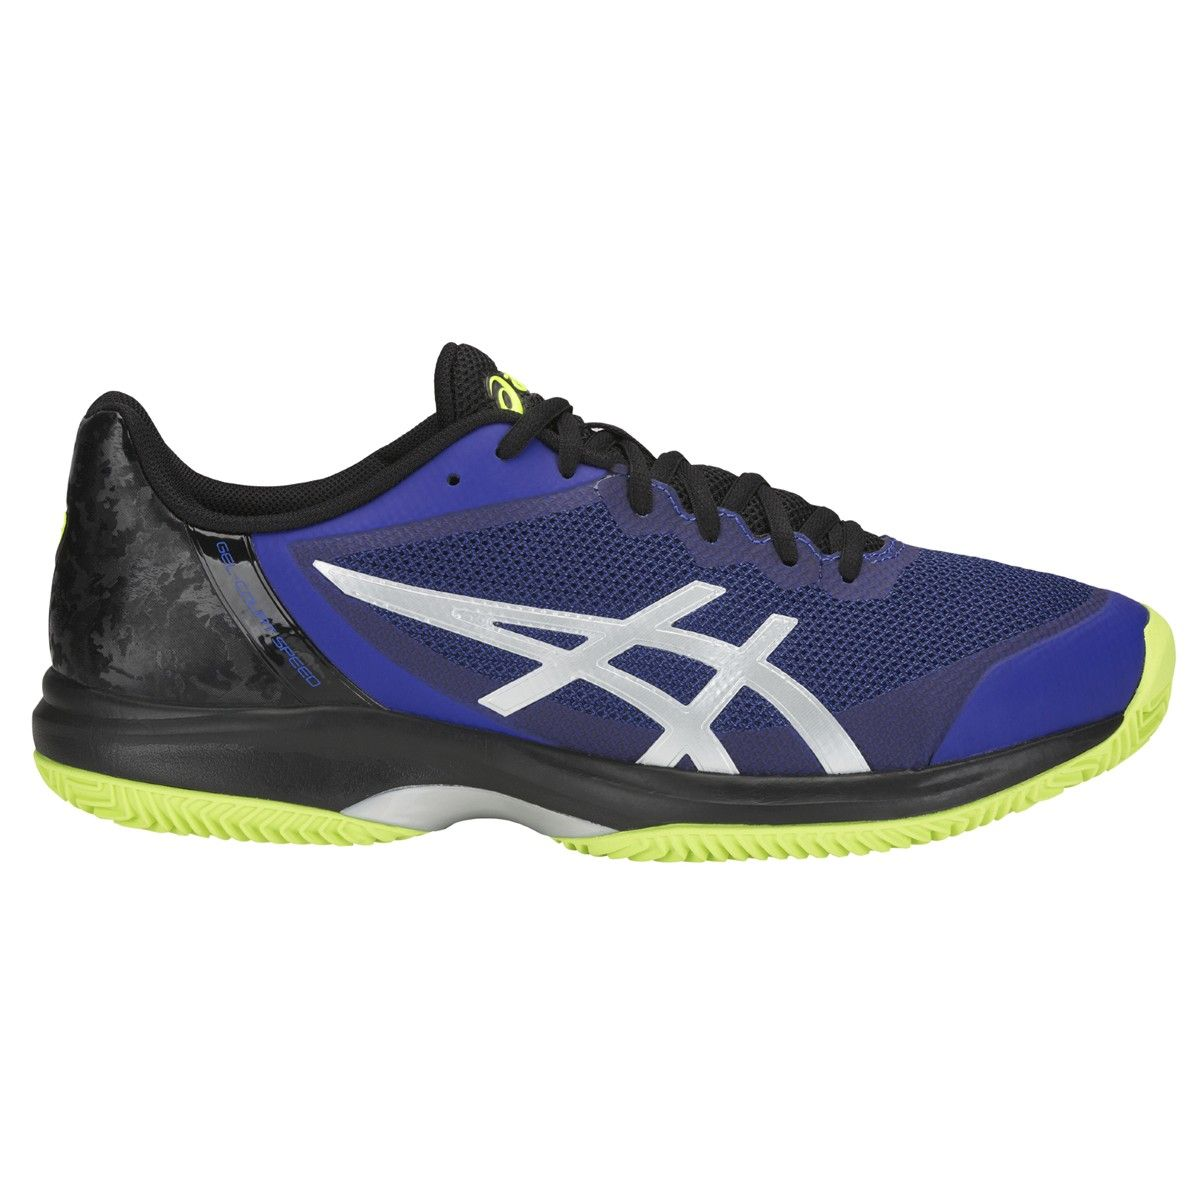 chaussures asics gel court speed terre battue